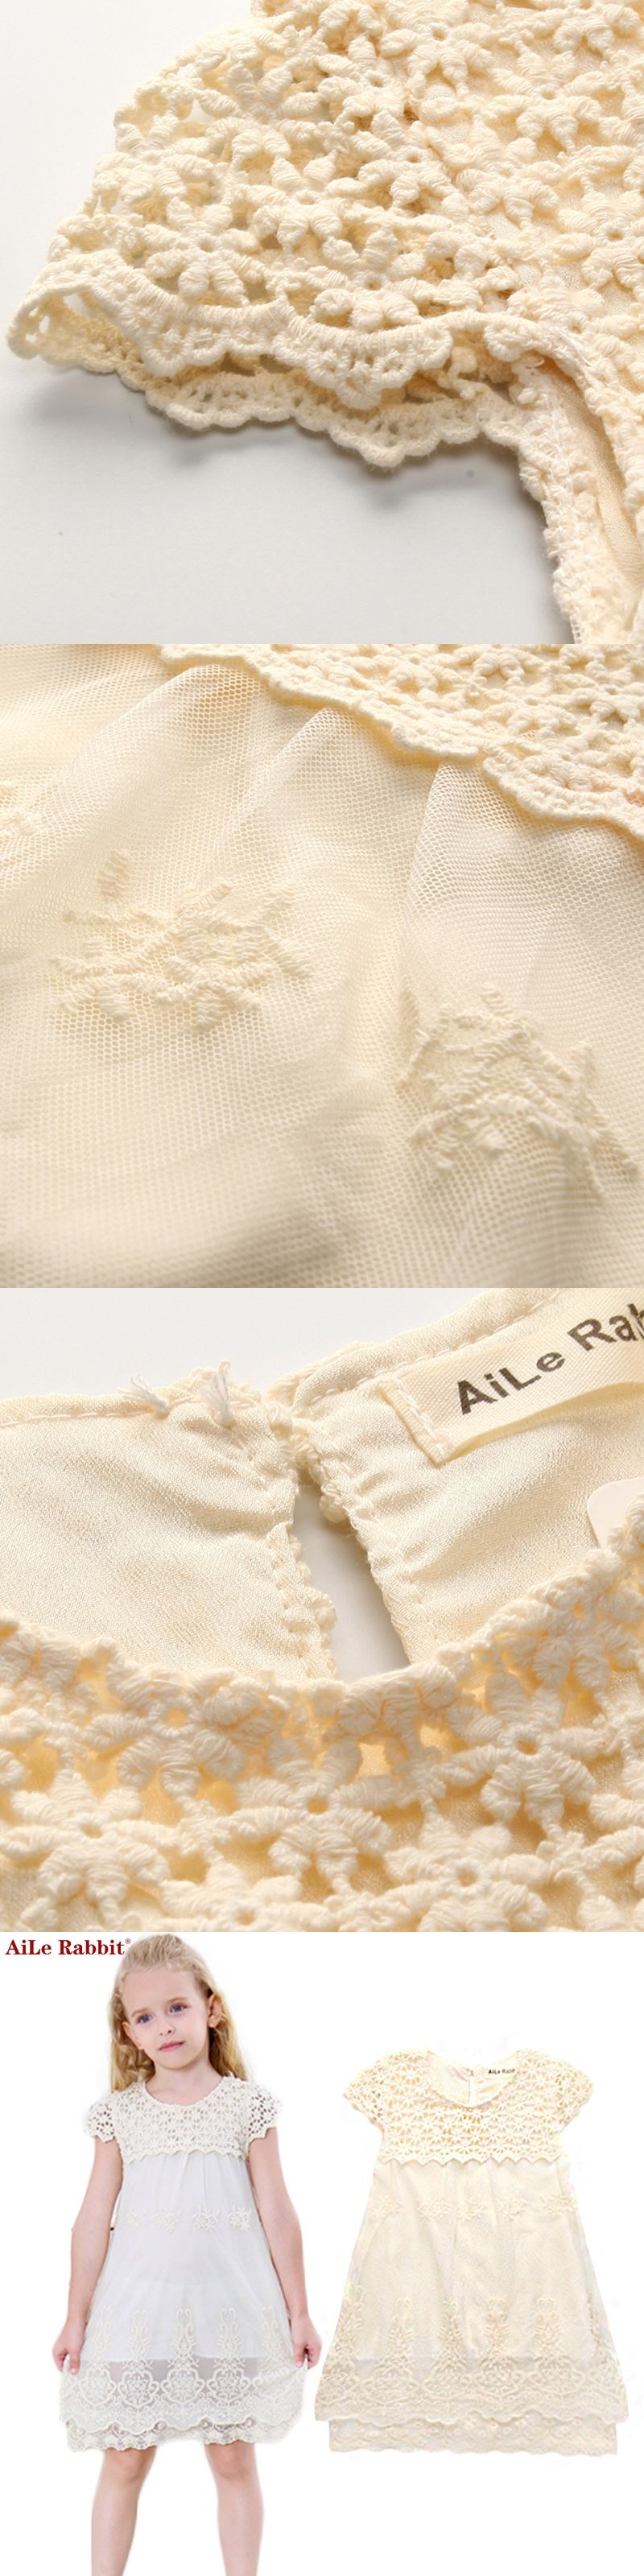 273a125078 AiLe Rabbit Girls Dress Summer Children Fashion Lace Princess Dress ...